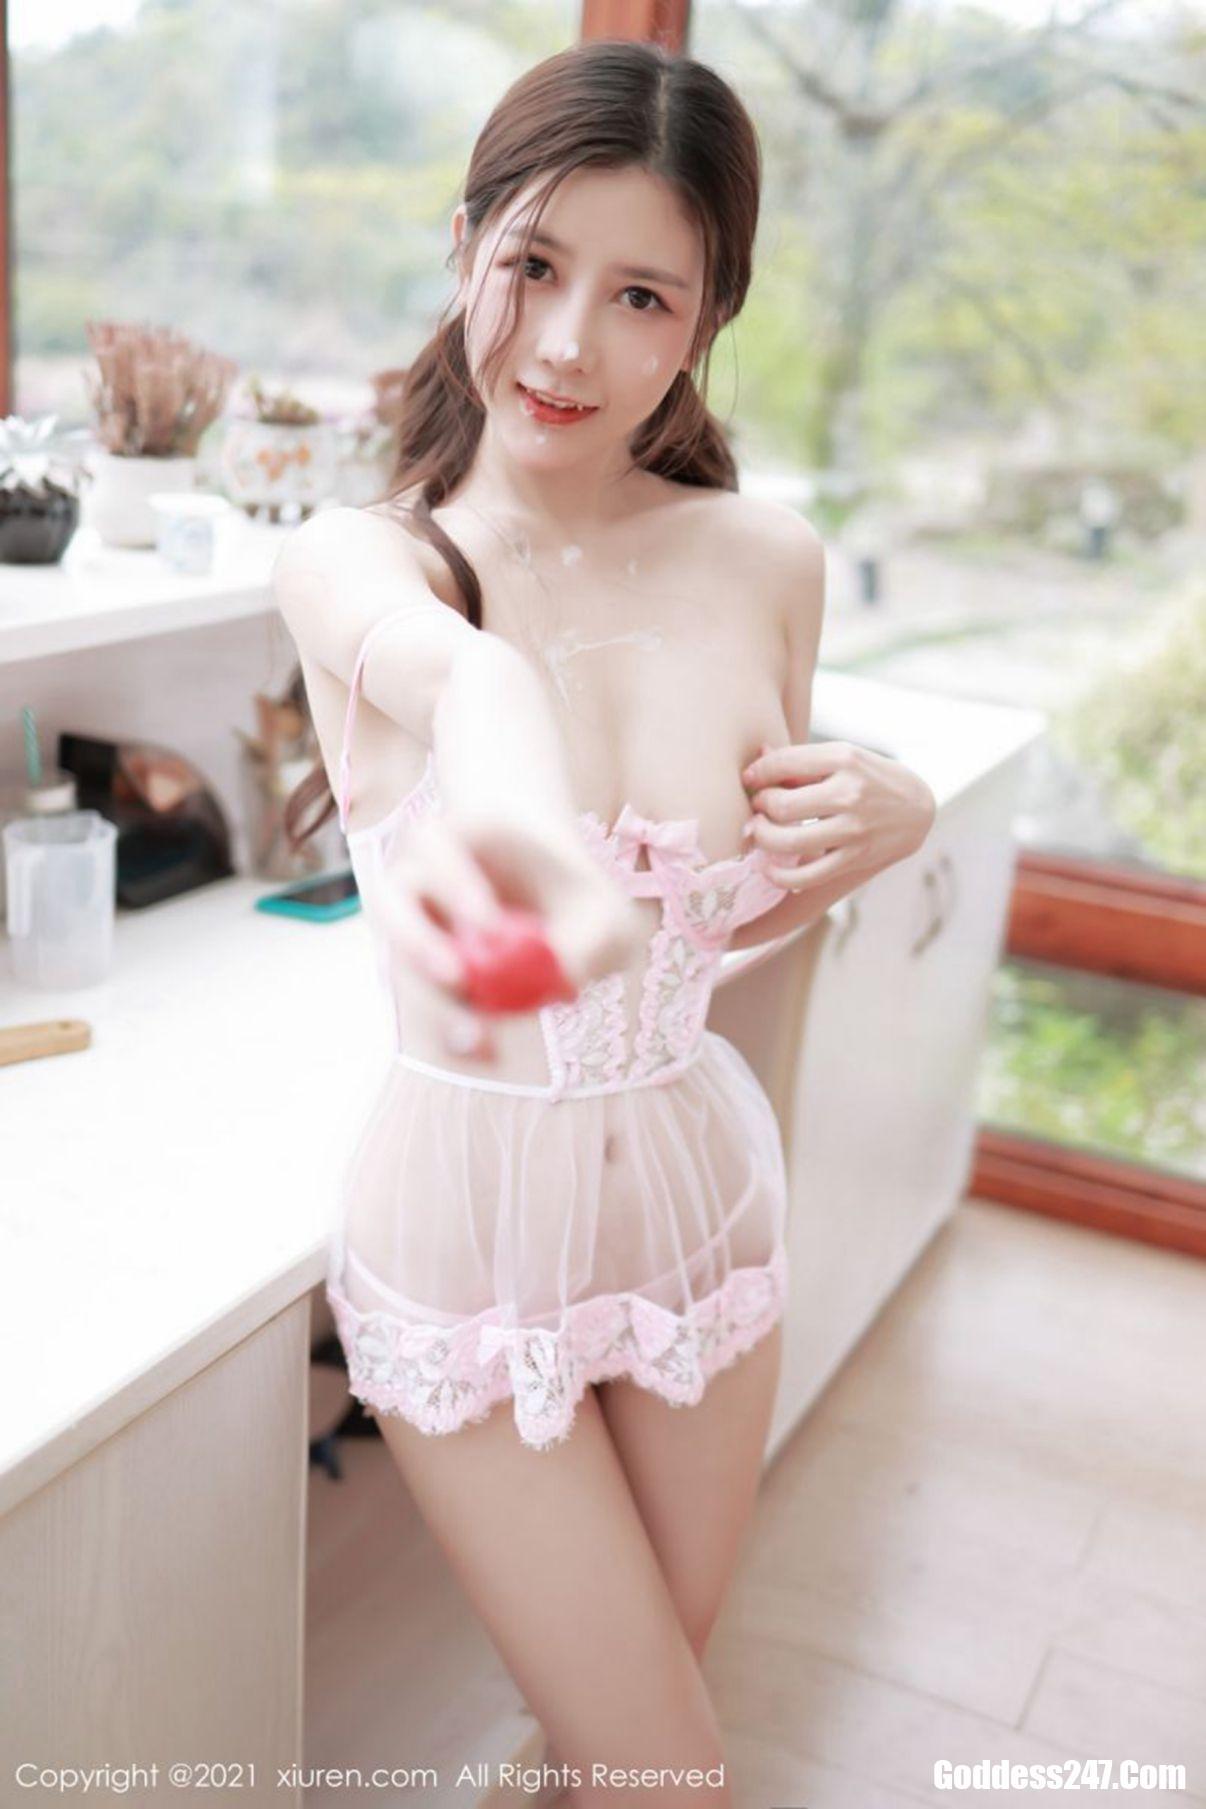 尹甜甜, Yi Tian Tian, XiuRen秀人网 No.3251 尹甜甜, XiuRen秀人网 No.3251